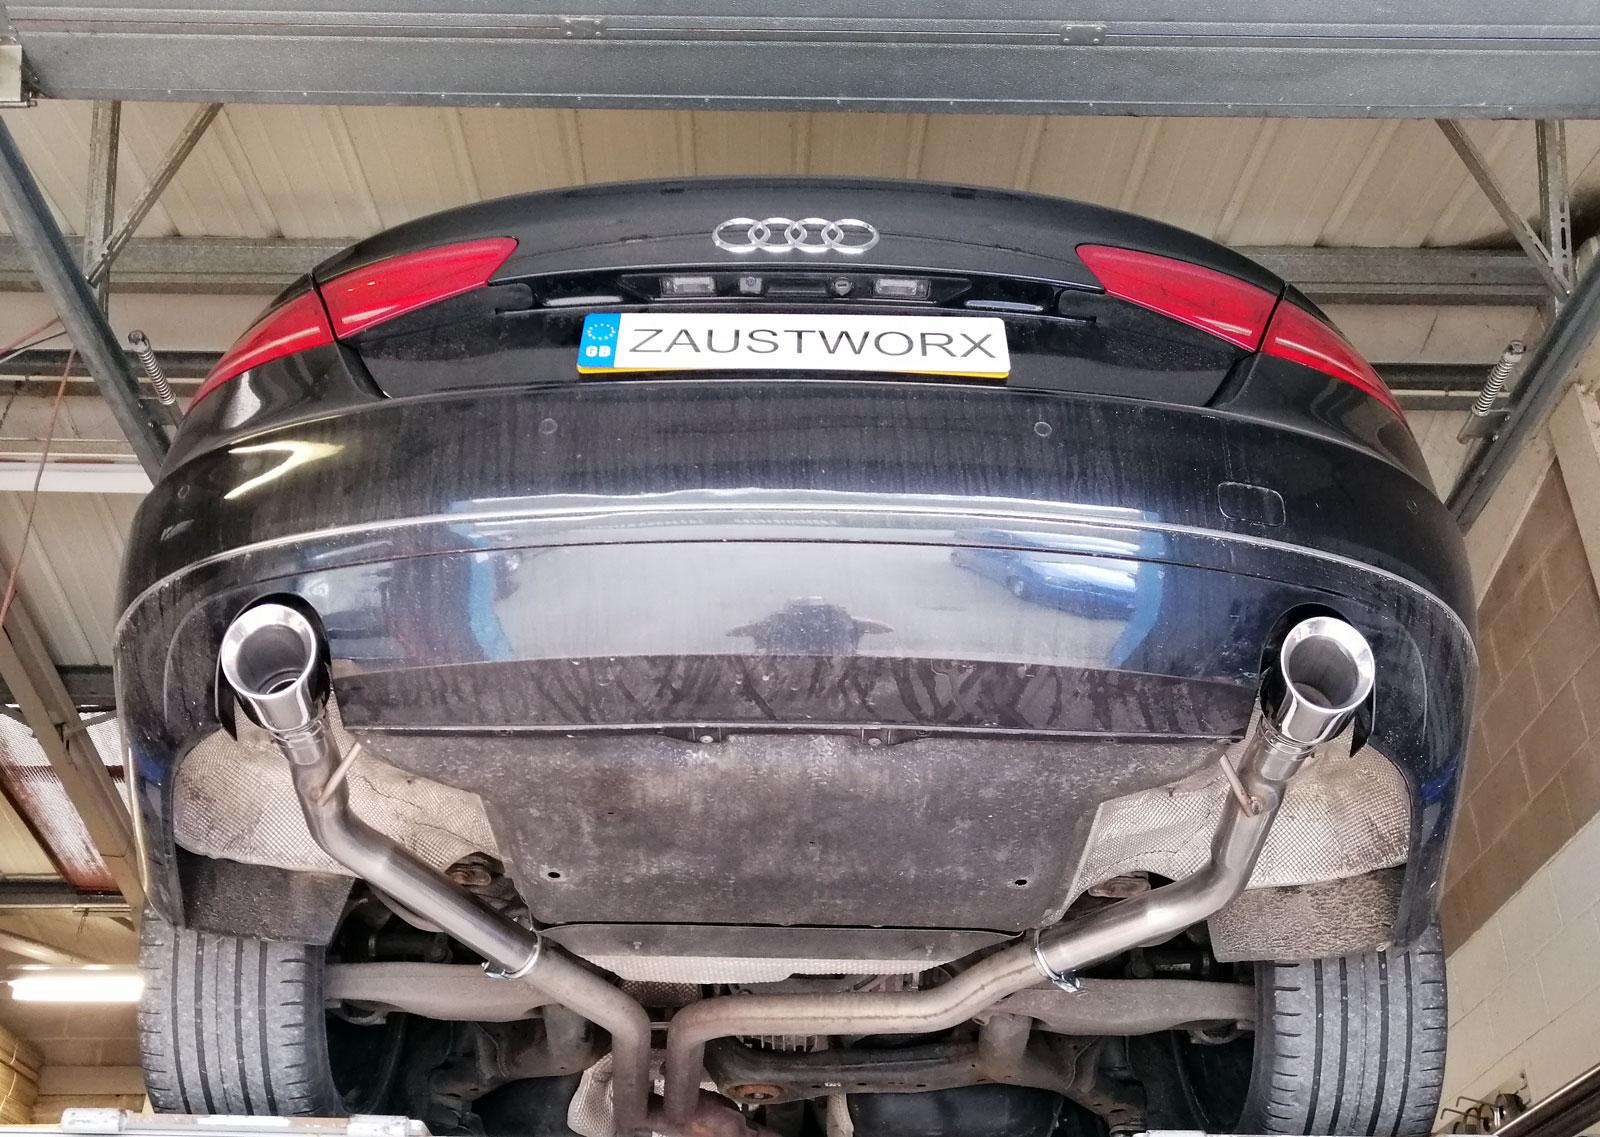 Audi A8 (D4) 3.0 TDi